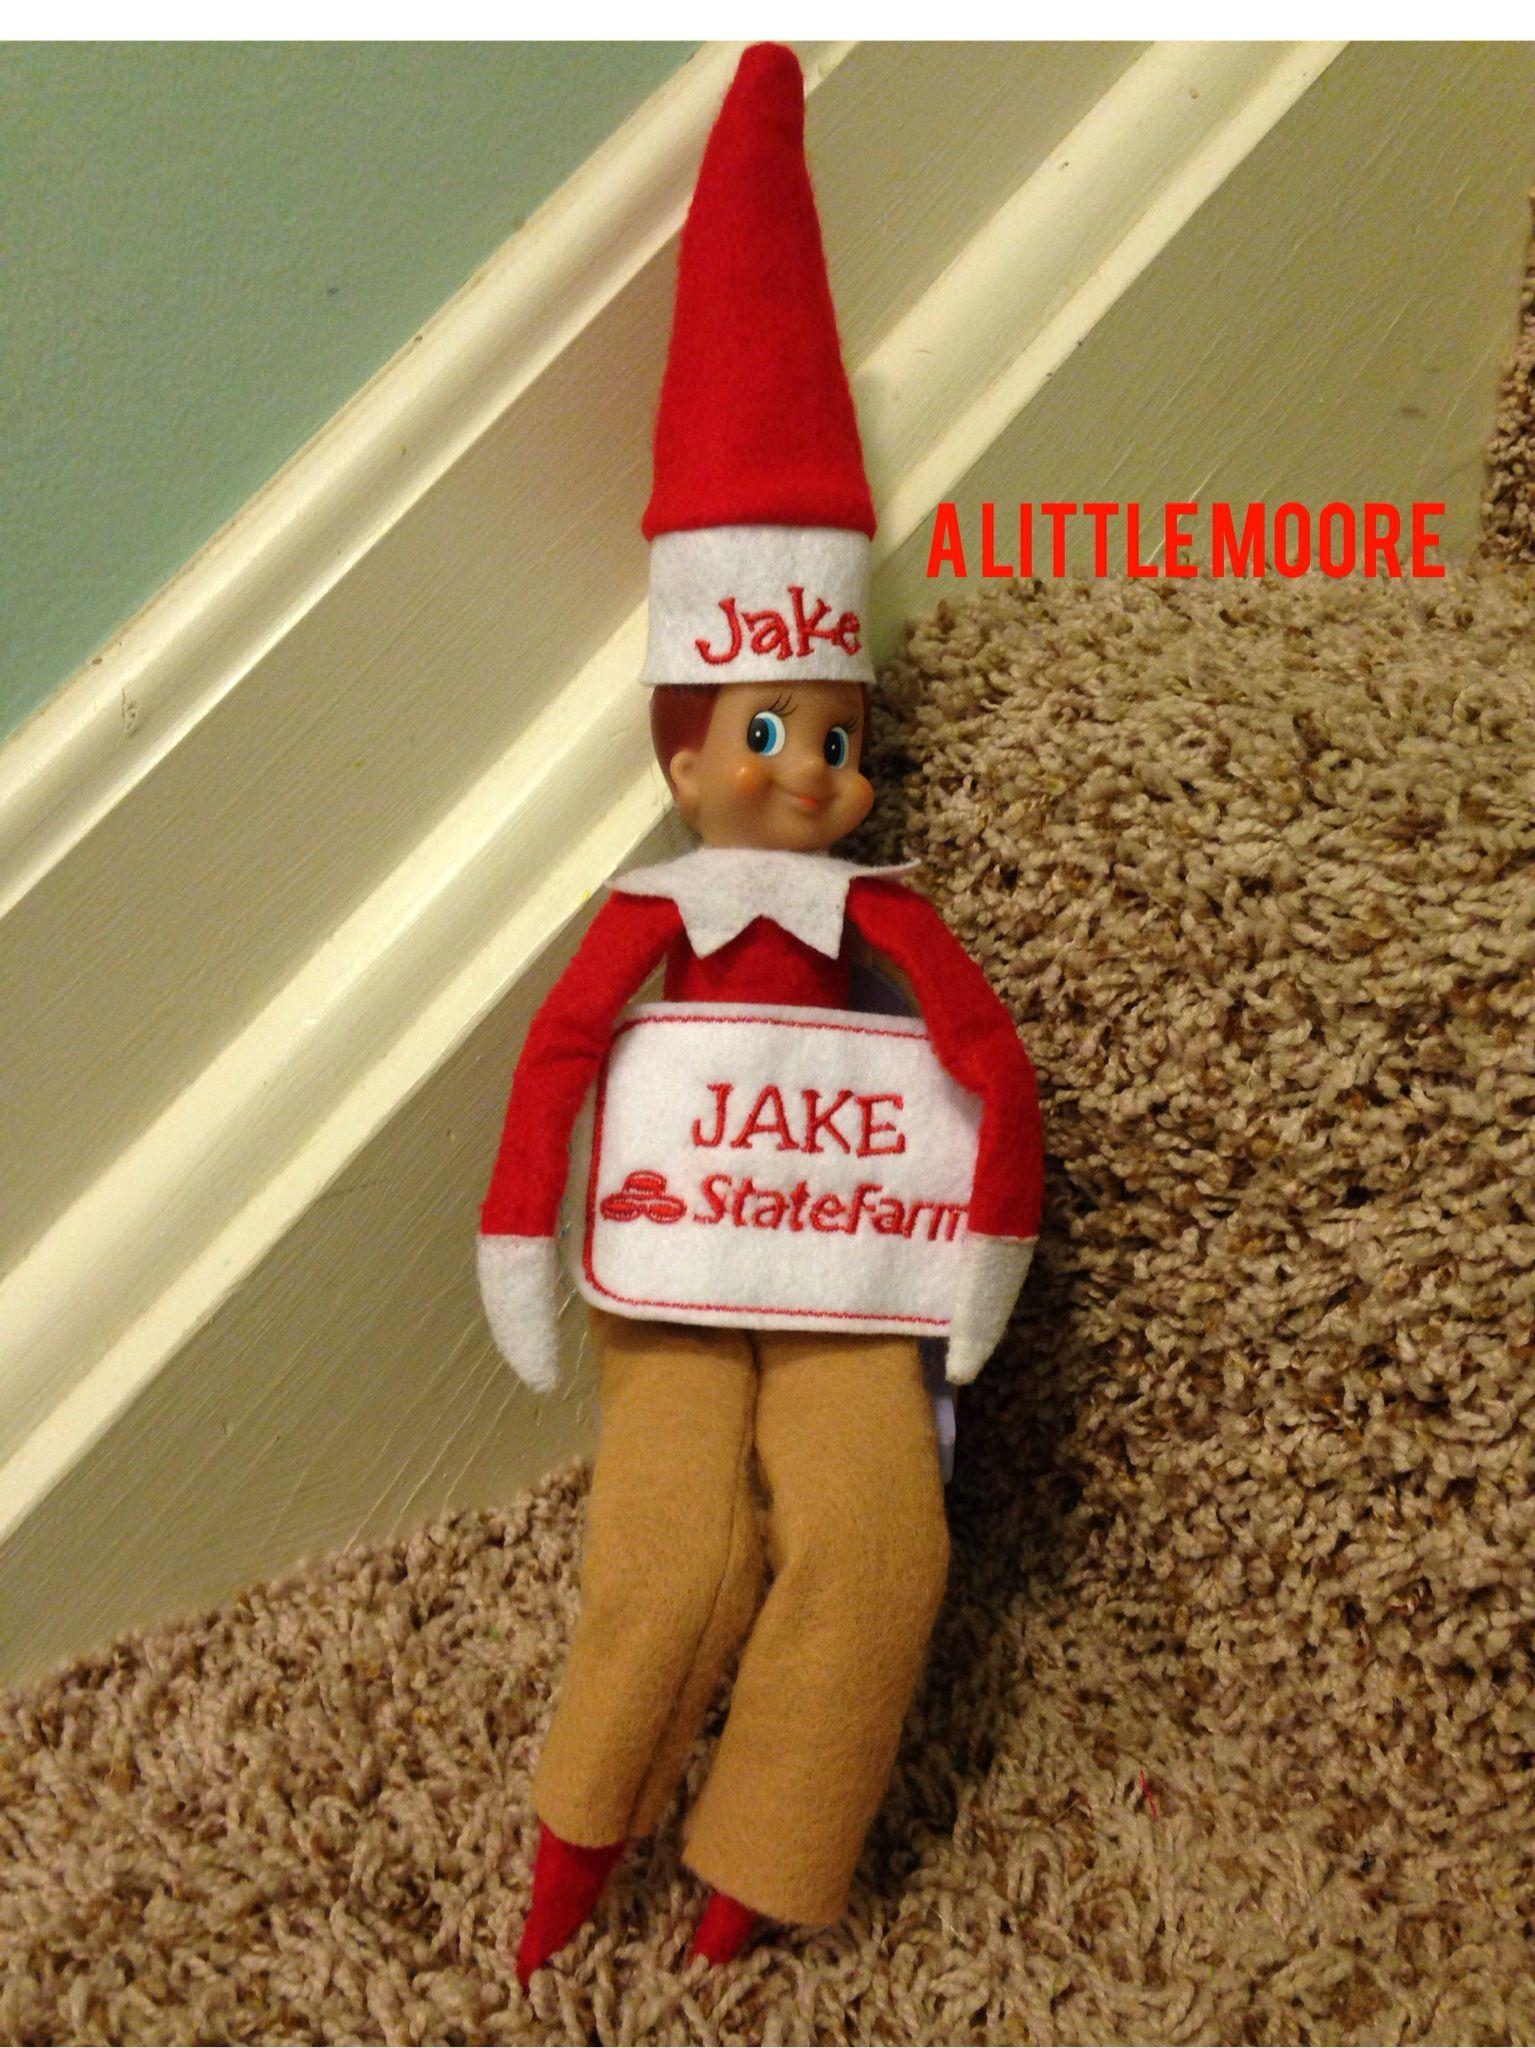 Jake from State Farm elf on the shelf! Elf on the Shelf